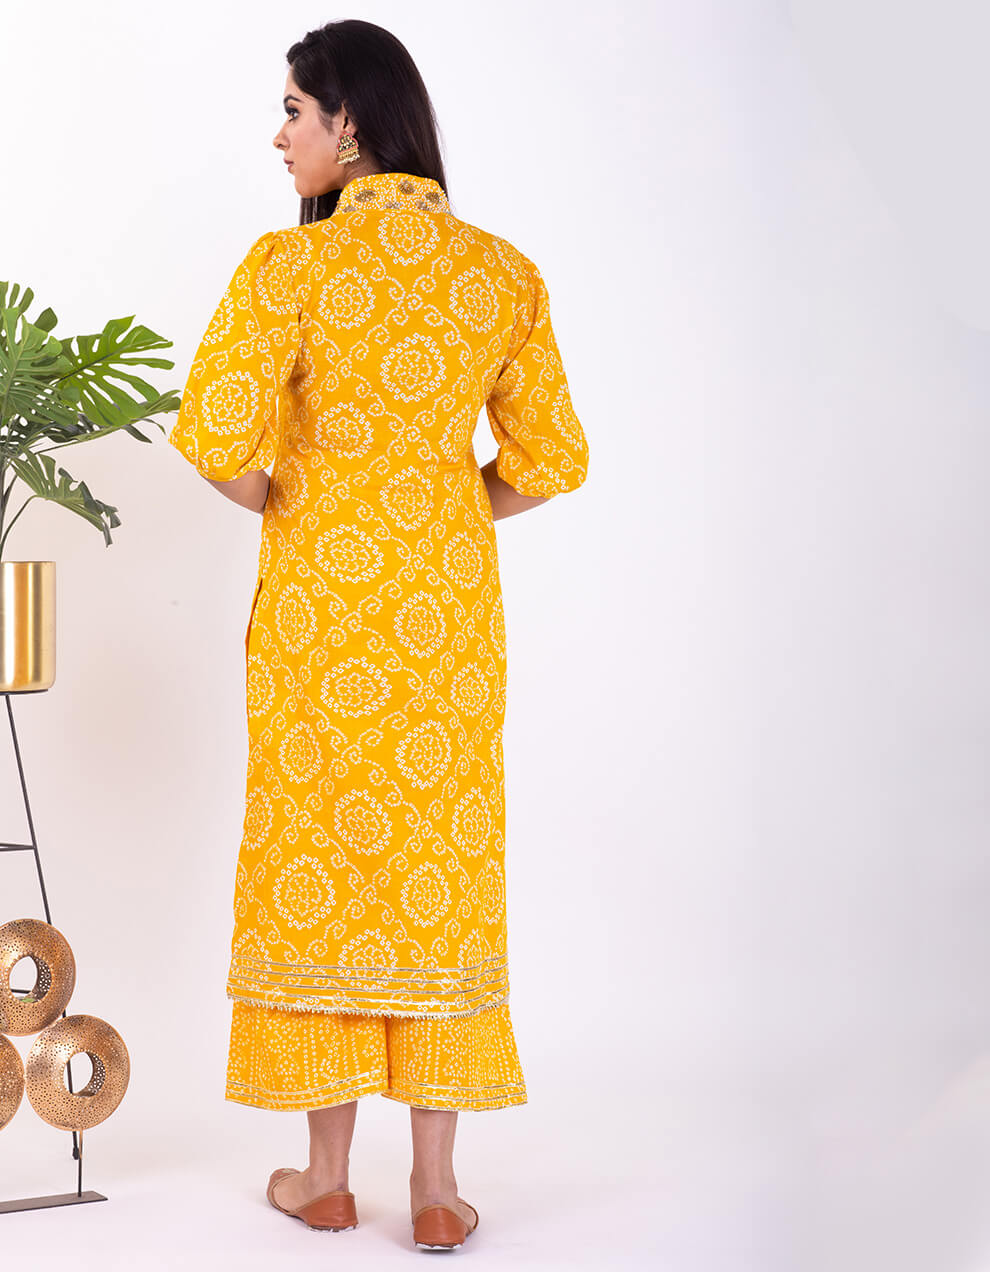 Yellow hand embroidered bandhani cotton kurta with pallazzo and dupatta- Set of 3